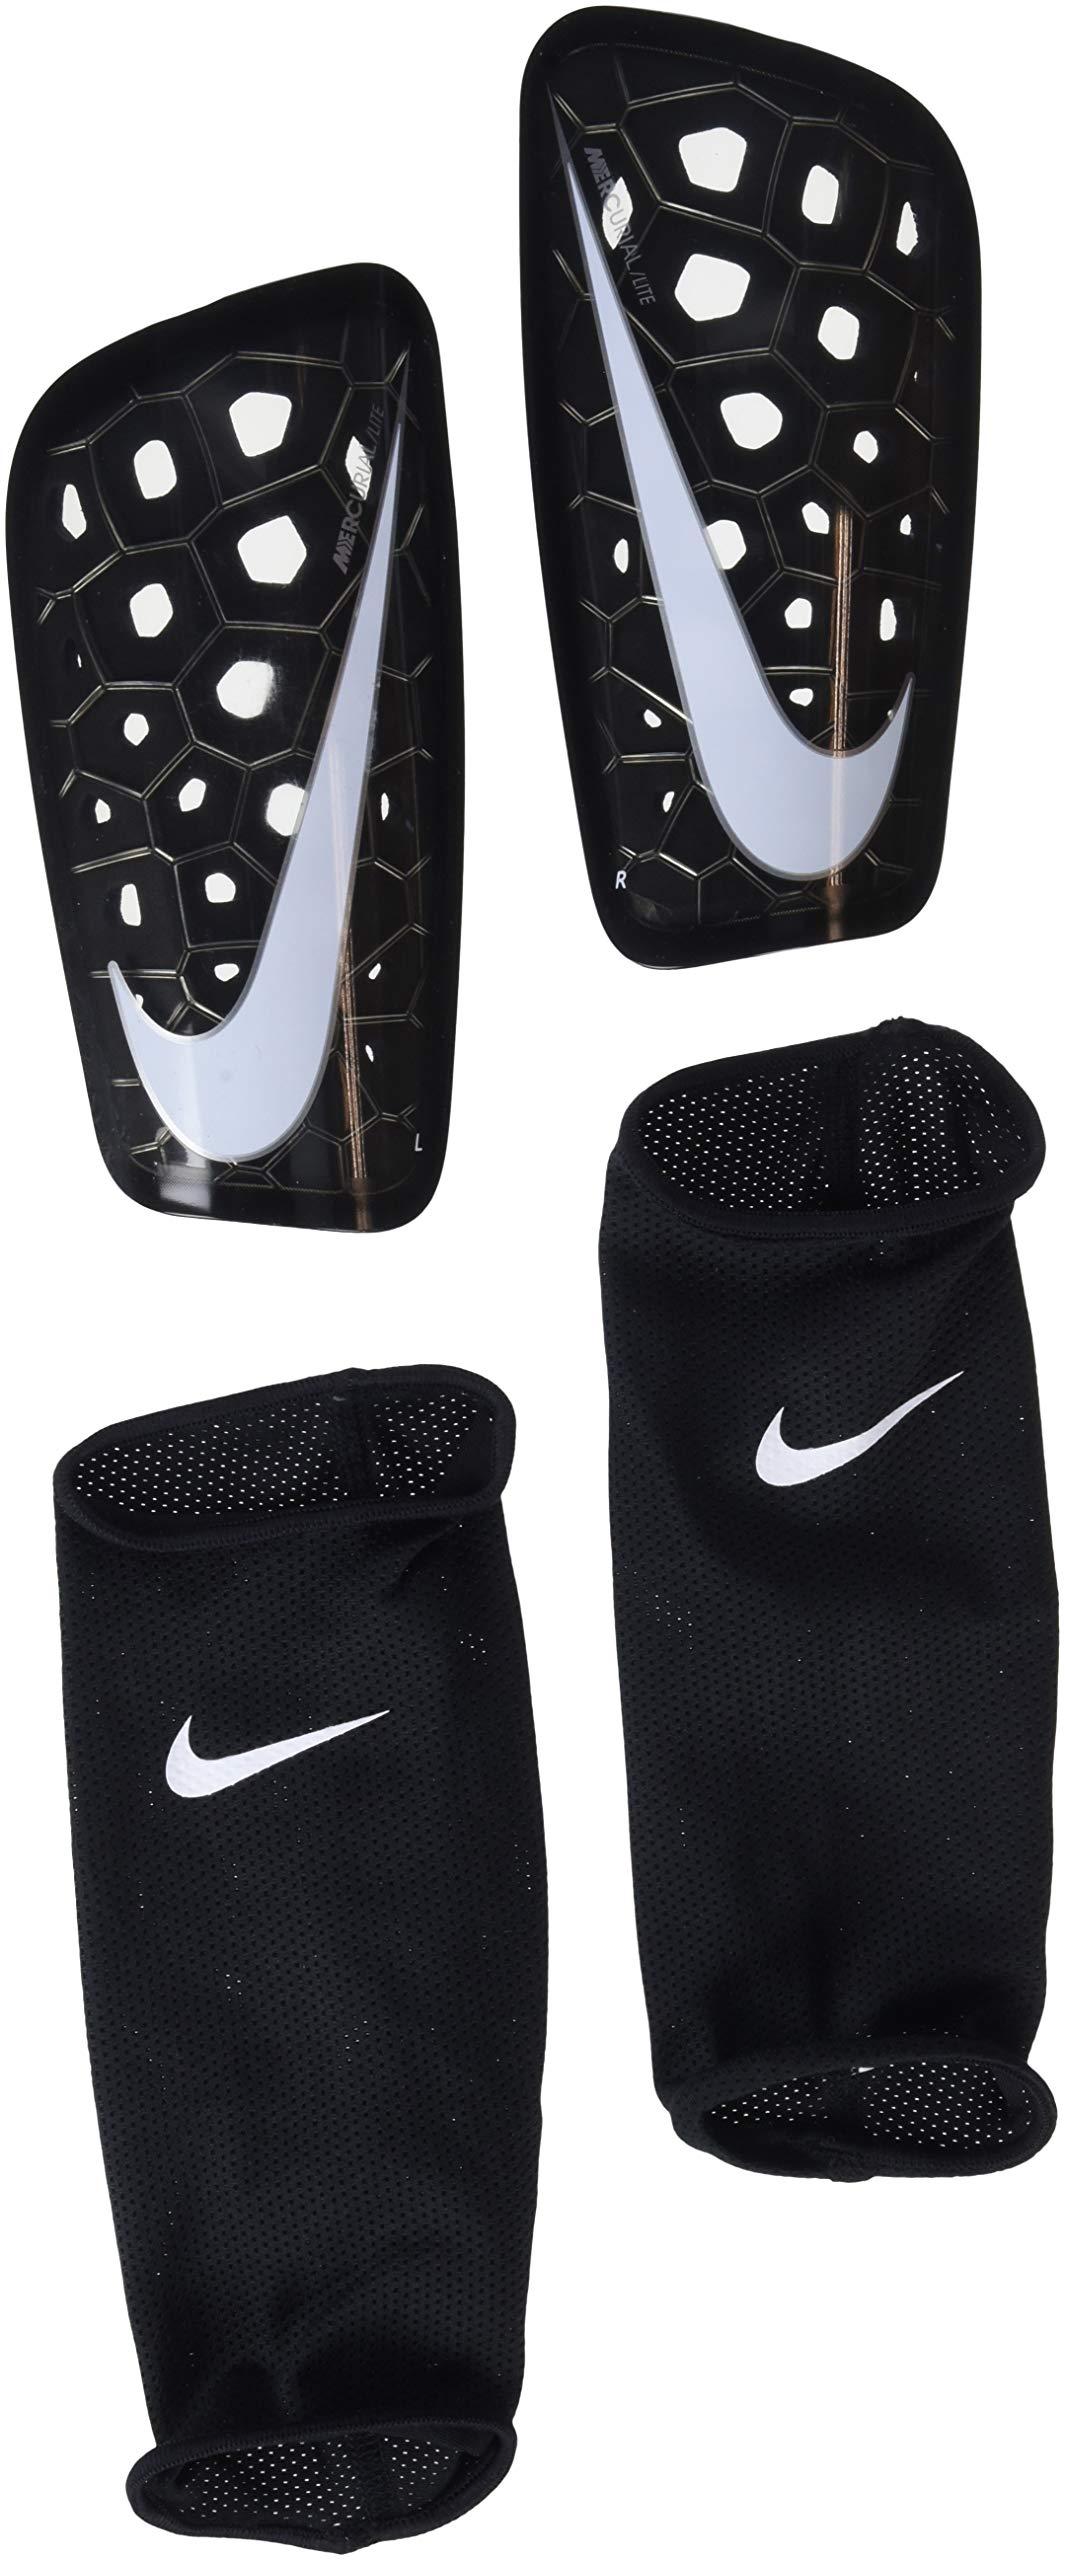 Nike Mercurial Lite Soccer Shin Guards (Medium, Black) by Nike